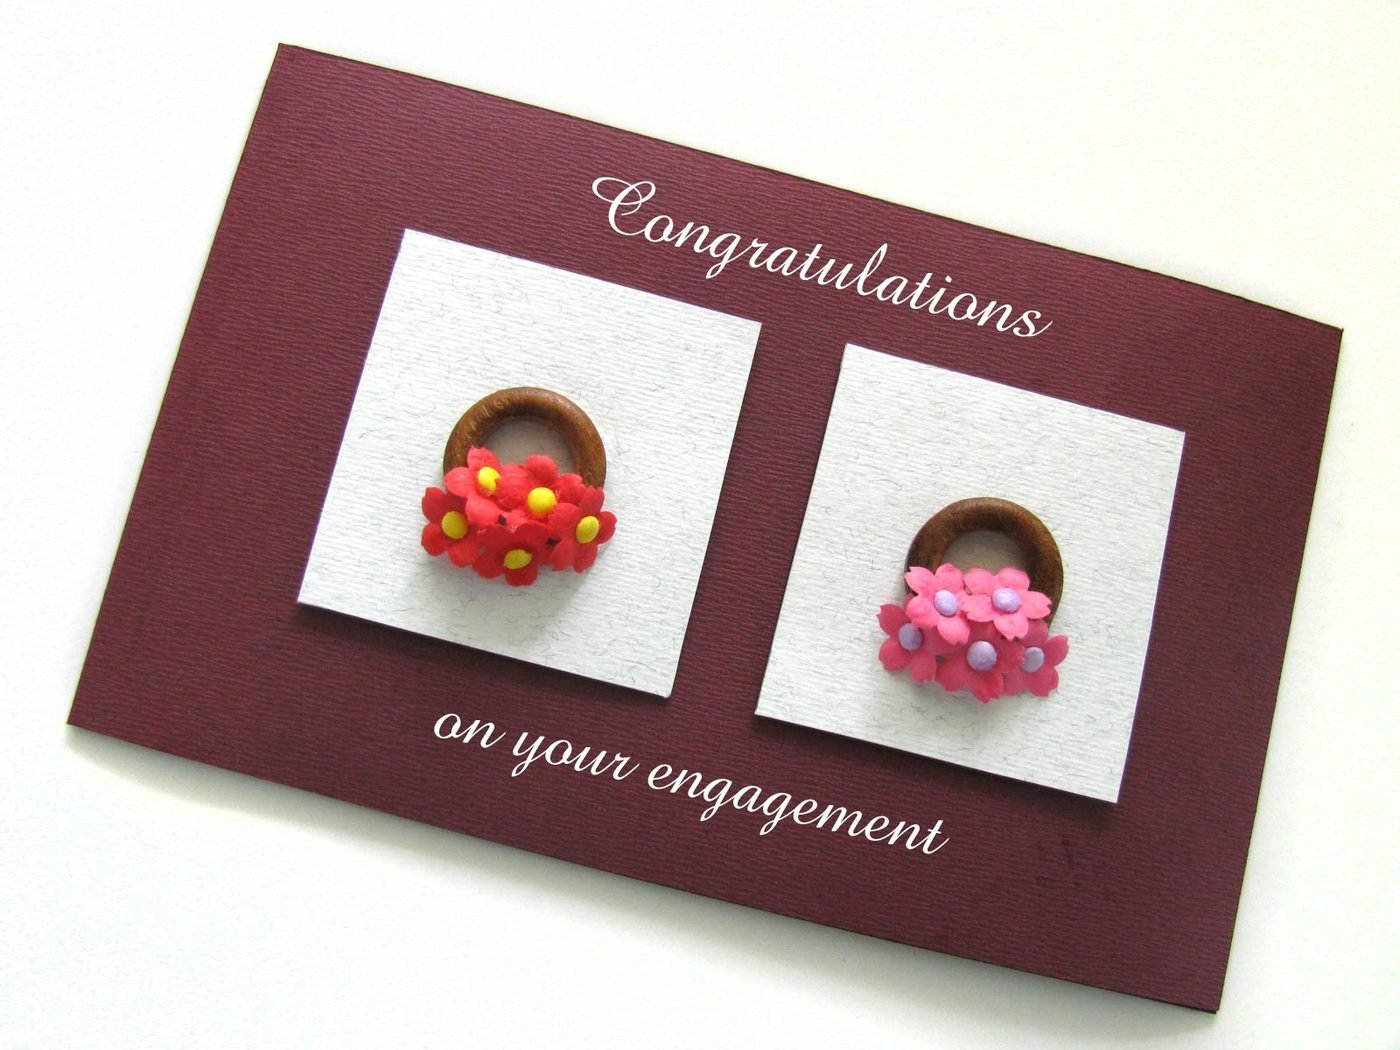 Handmade Cards By Shreya Mehta At Coroflot